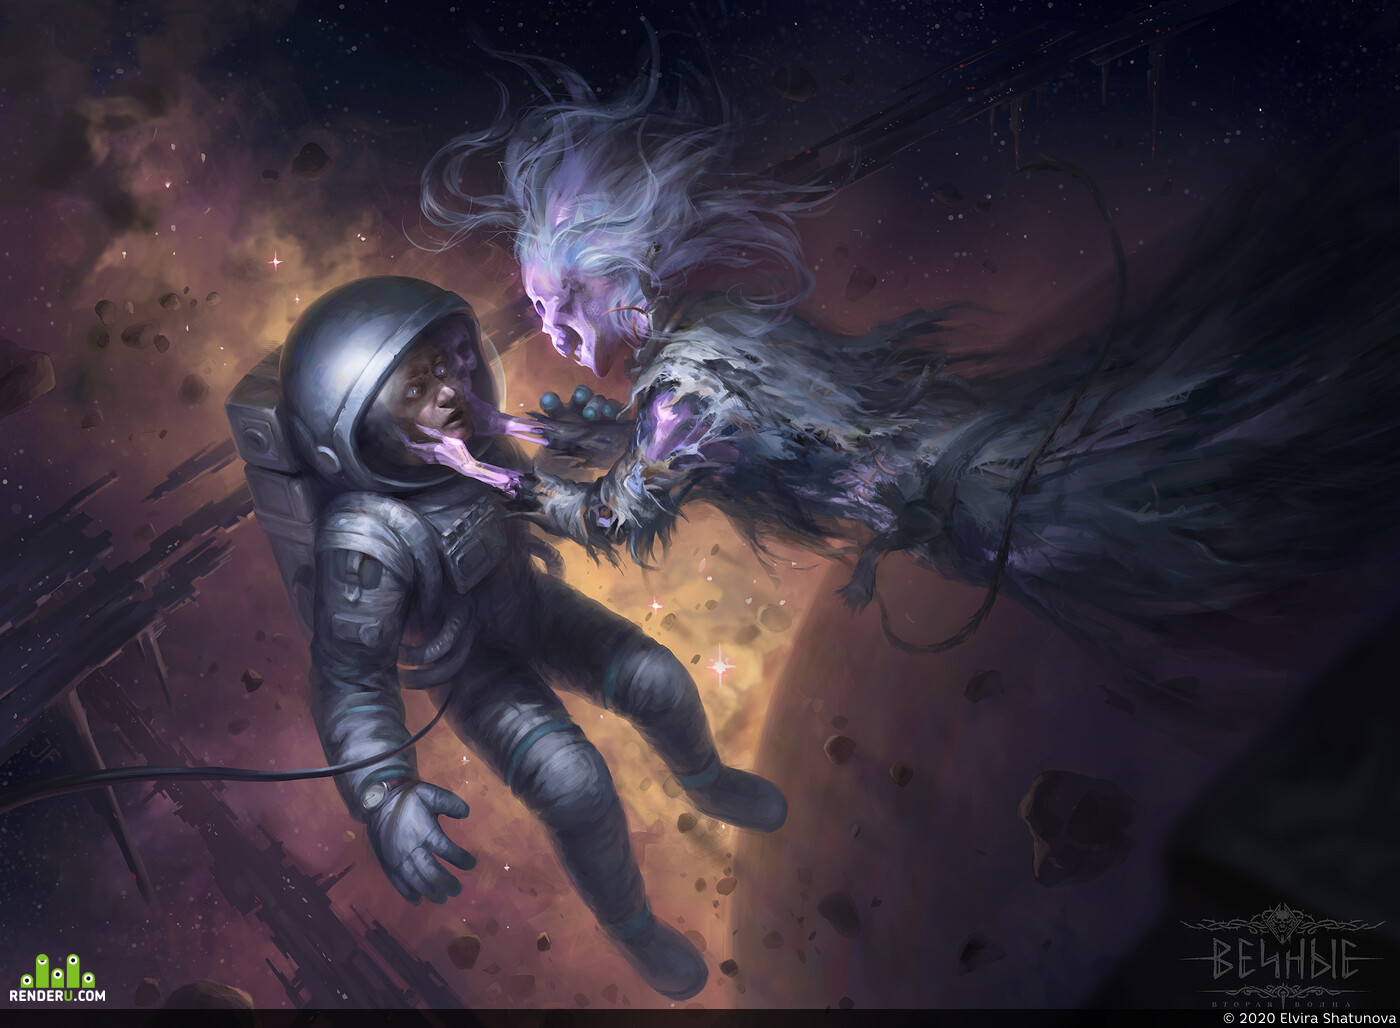 Eternal, Ghost, astronaut, cosmonaut, Space, Horror, planet, stars